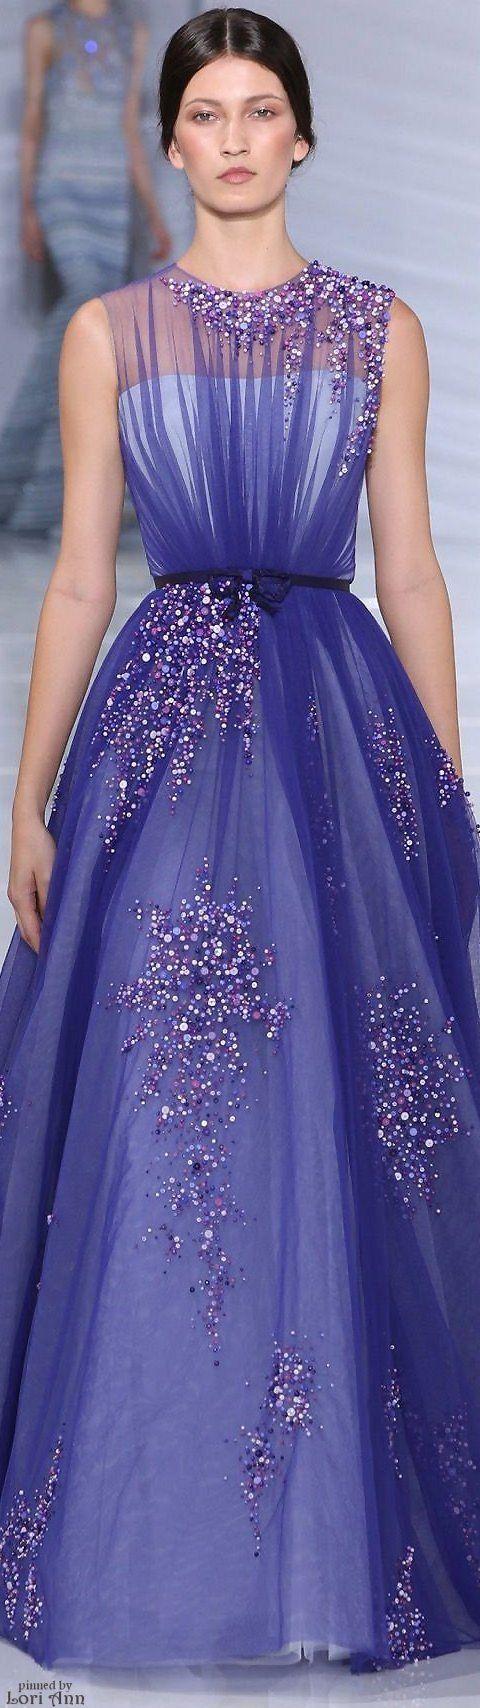 Pin de Darlene Hegyi en Long dresses | Pinterest